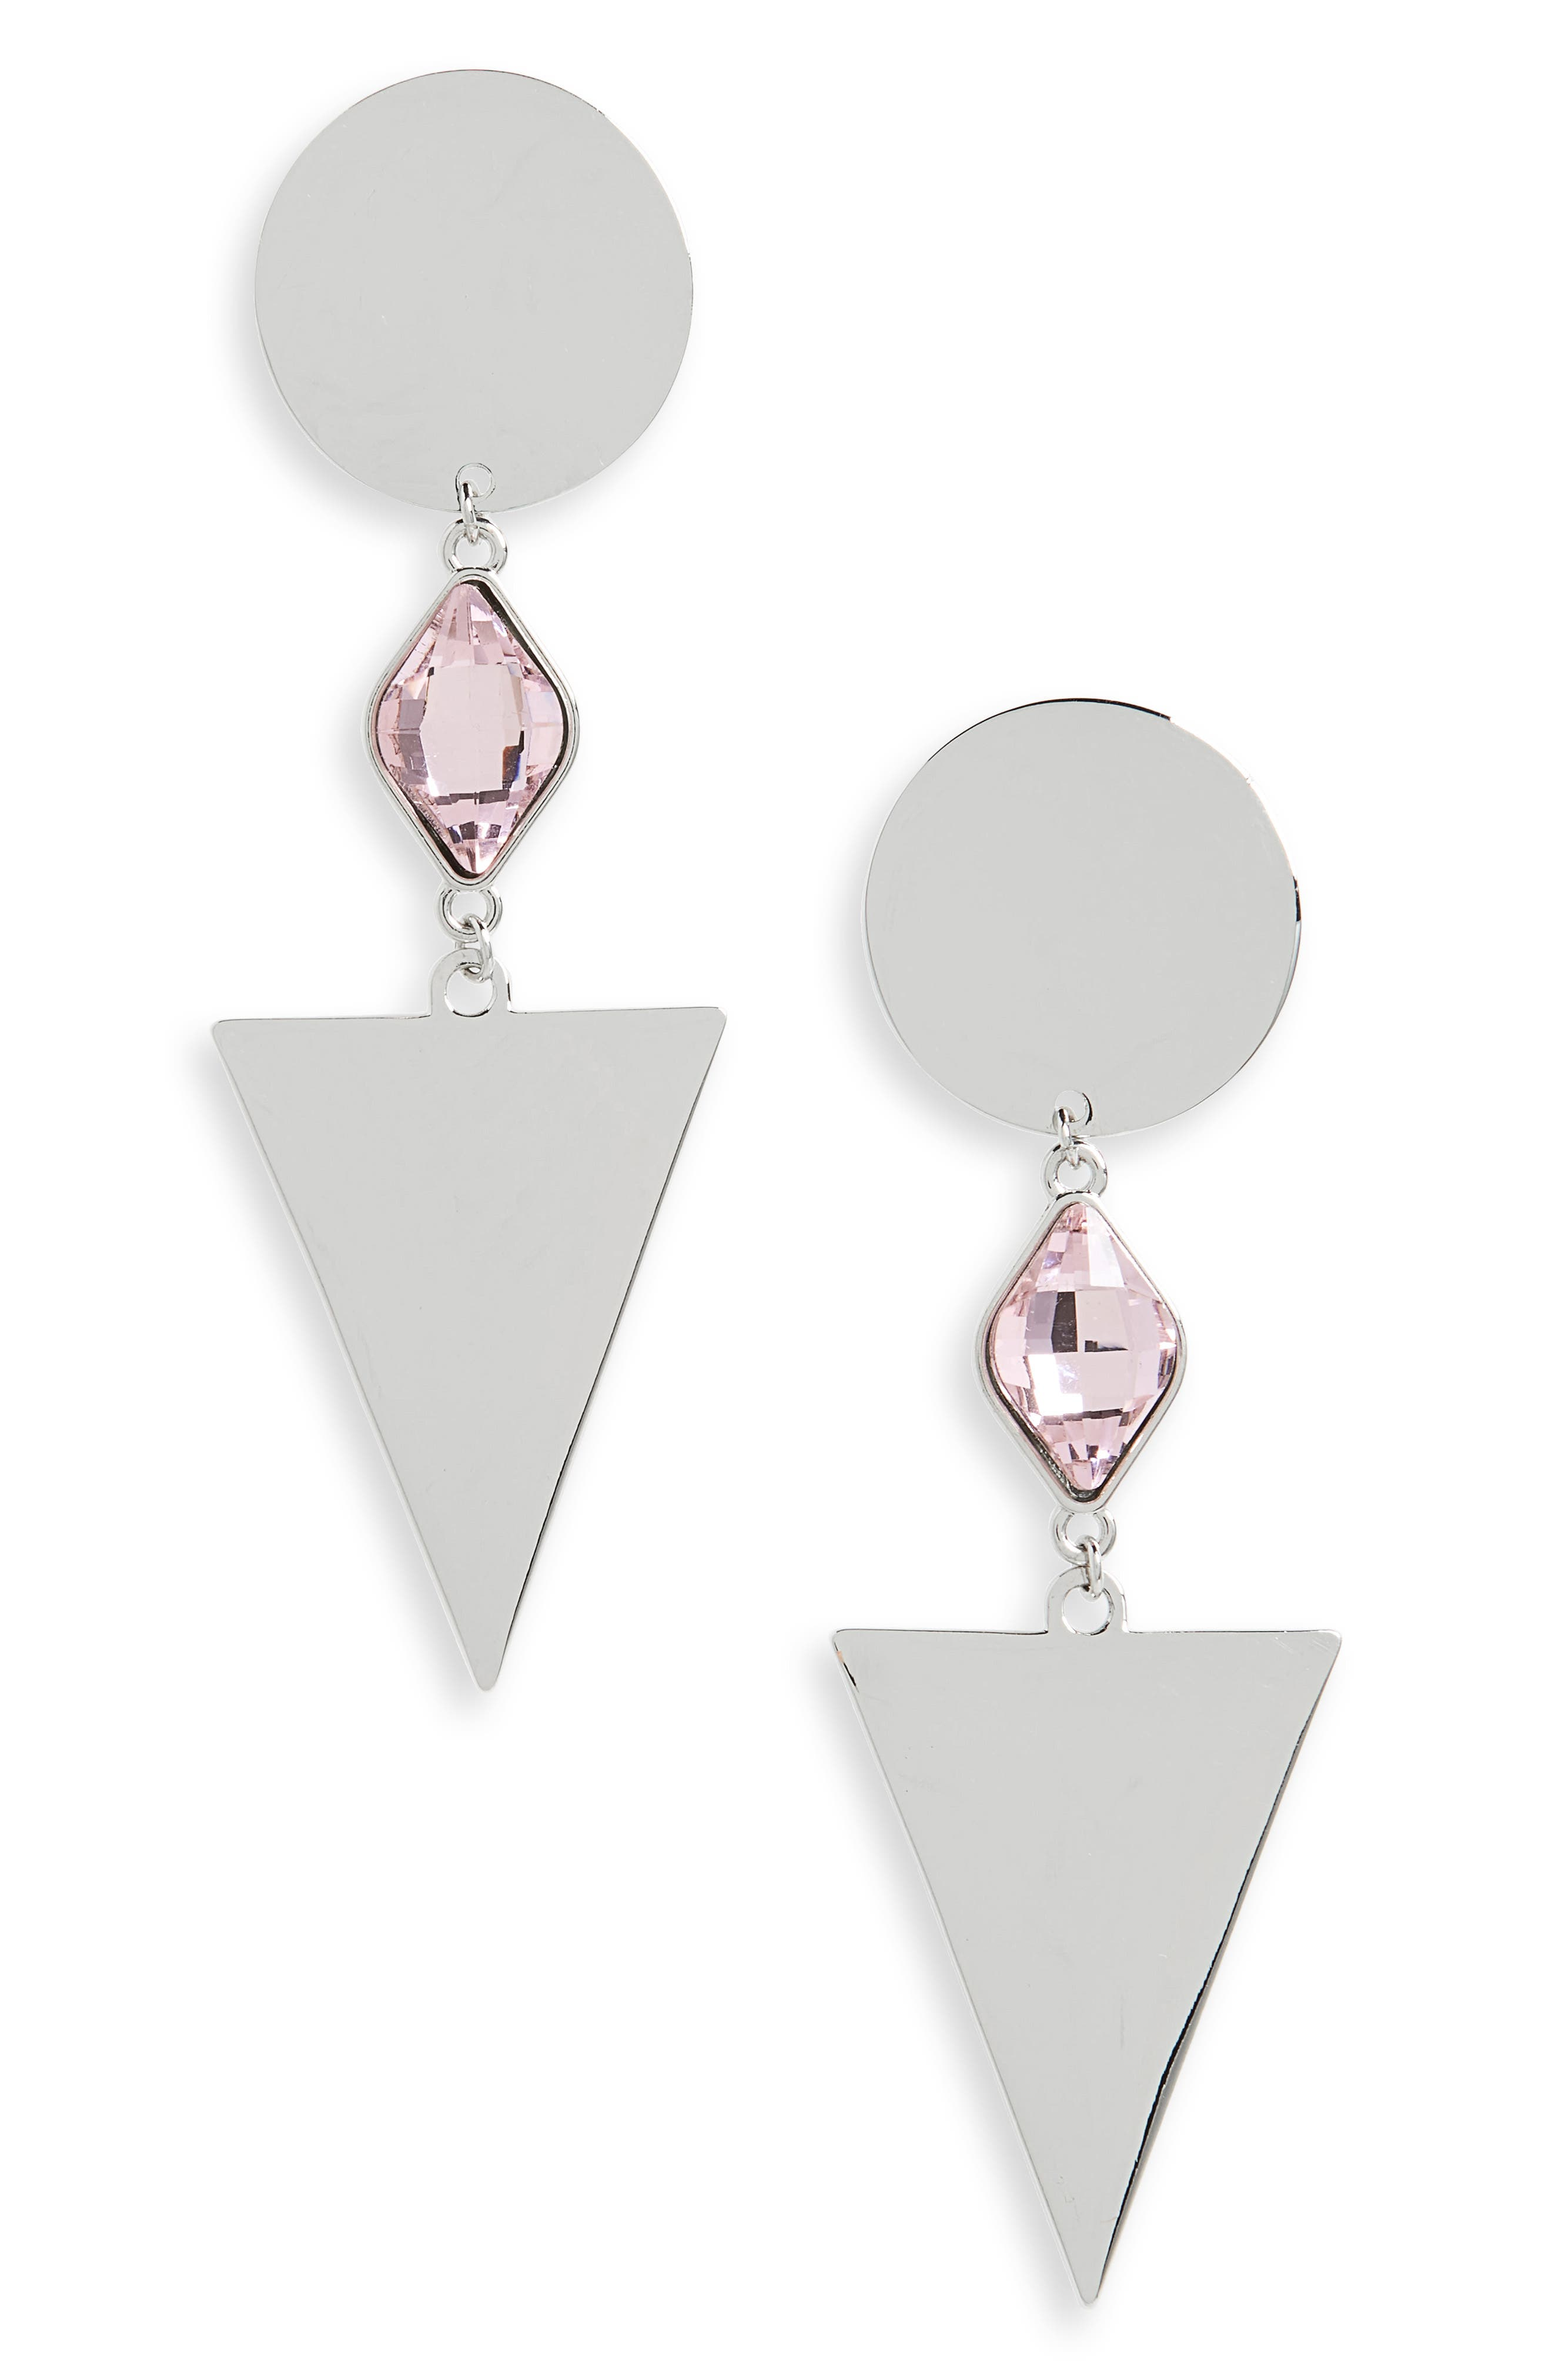 Geometric Crystal Drop Earrings,                             Main thumbnail 1, color,                             Silver/ Pink